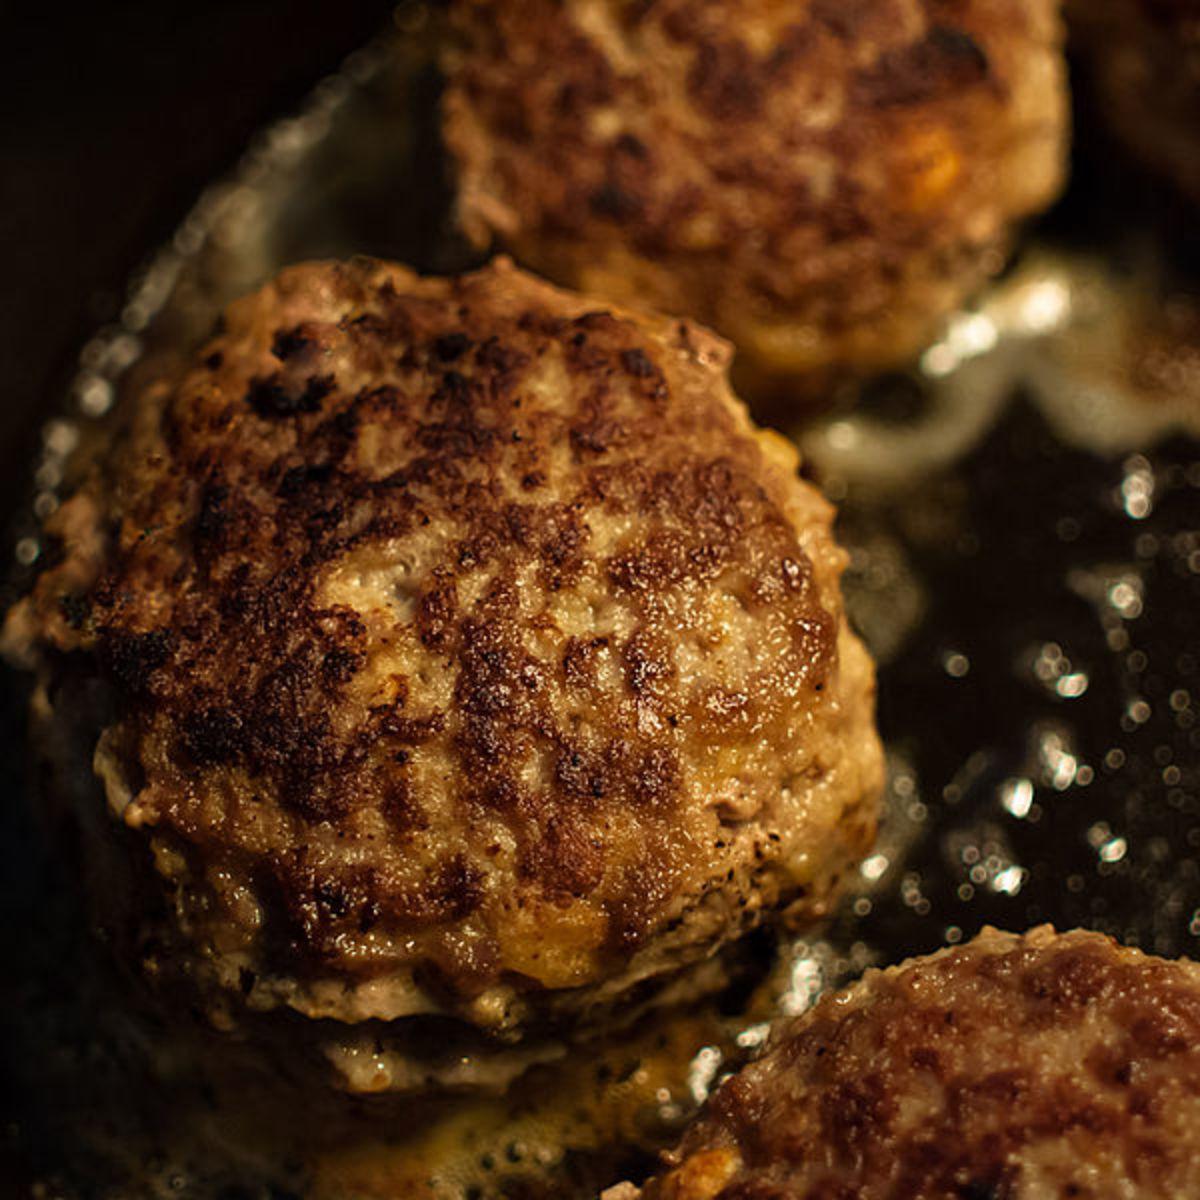 Yummy meatballs!